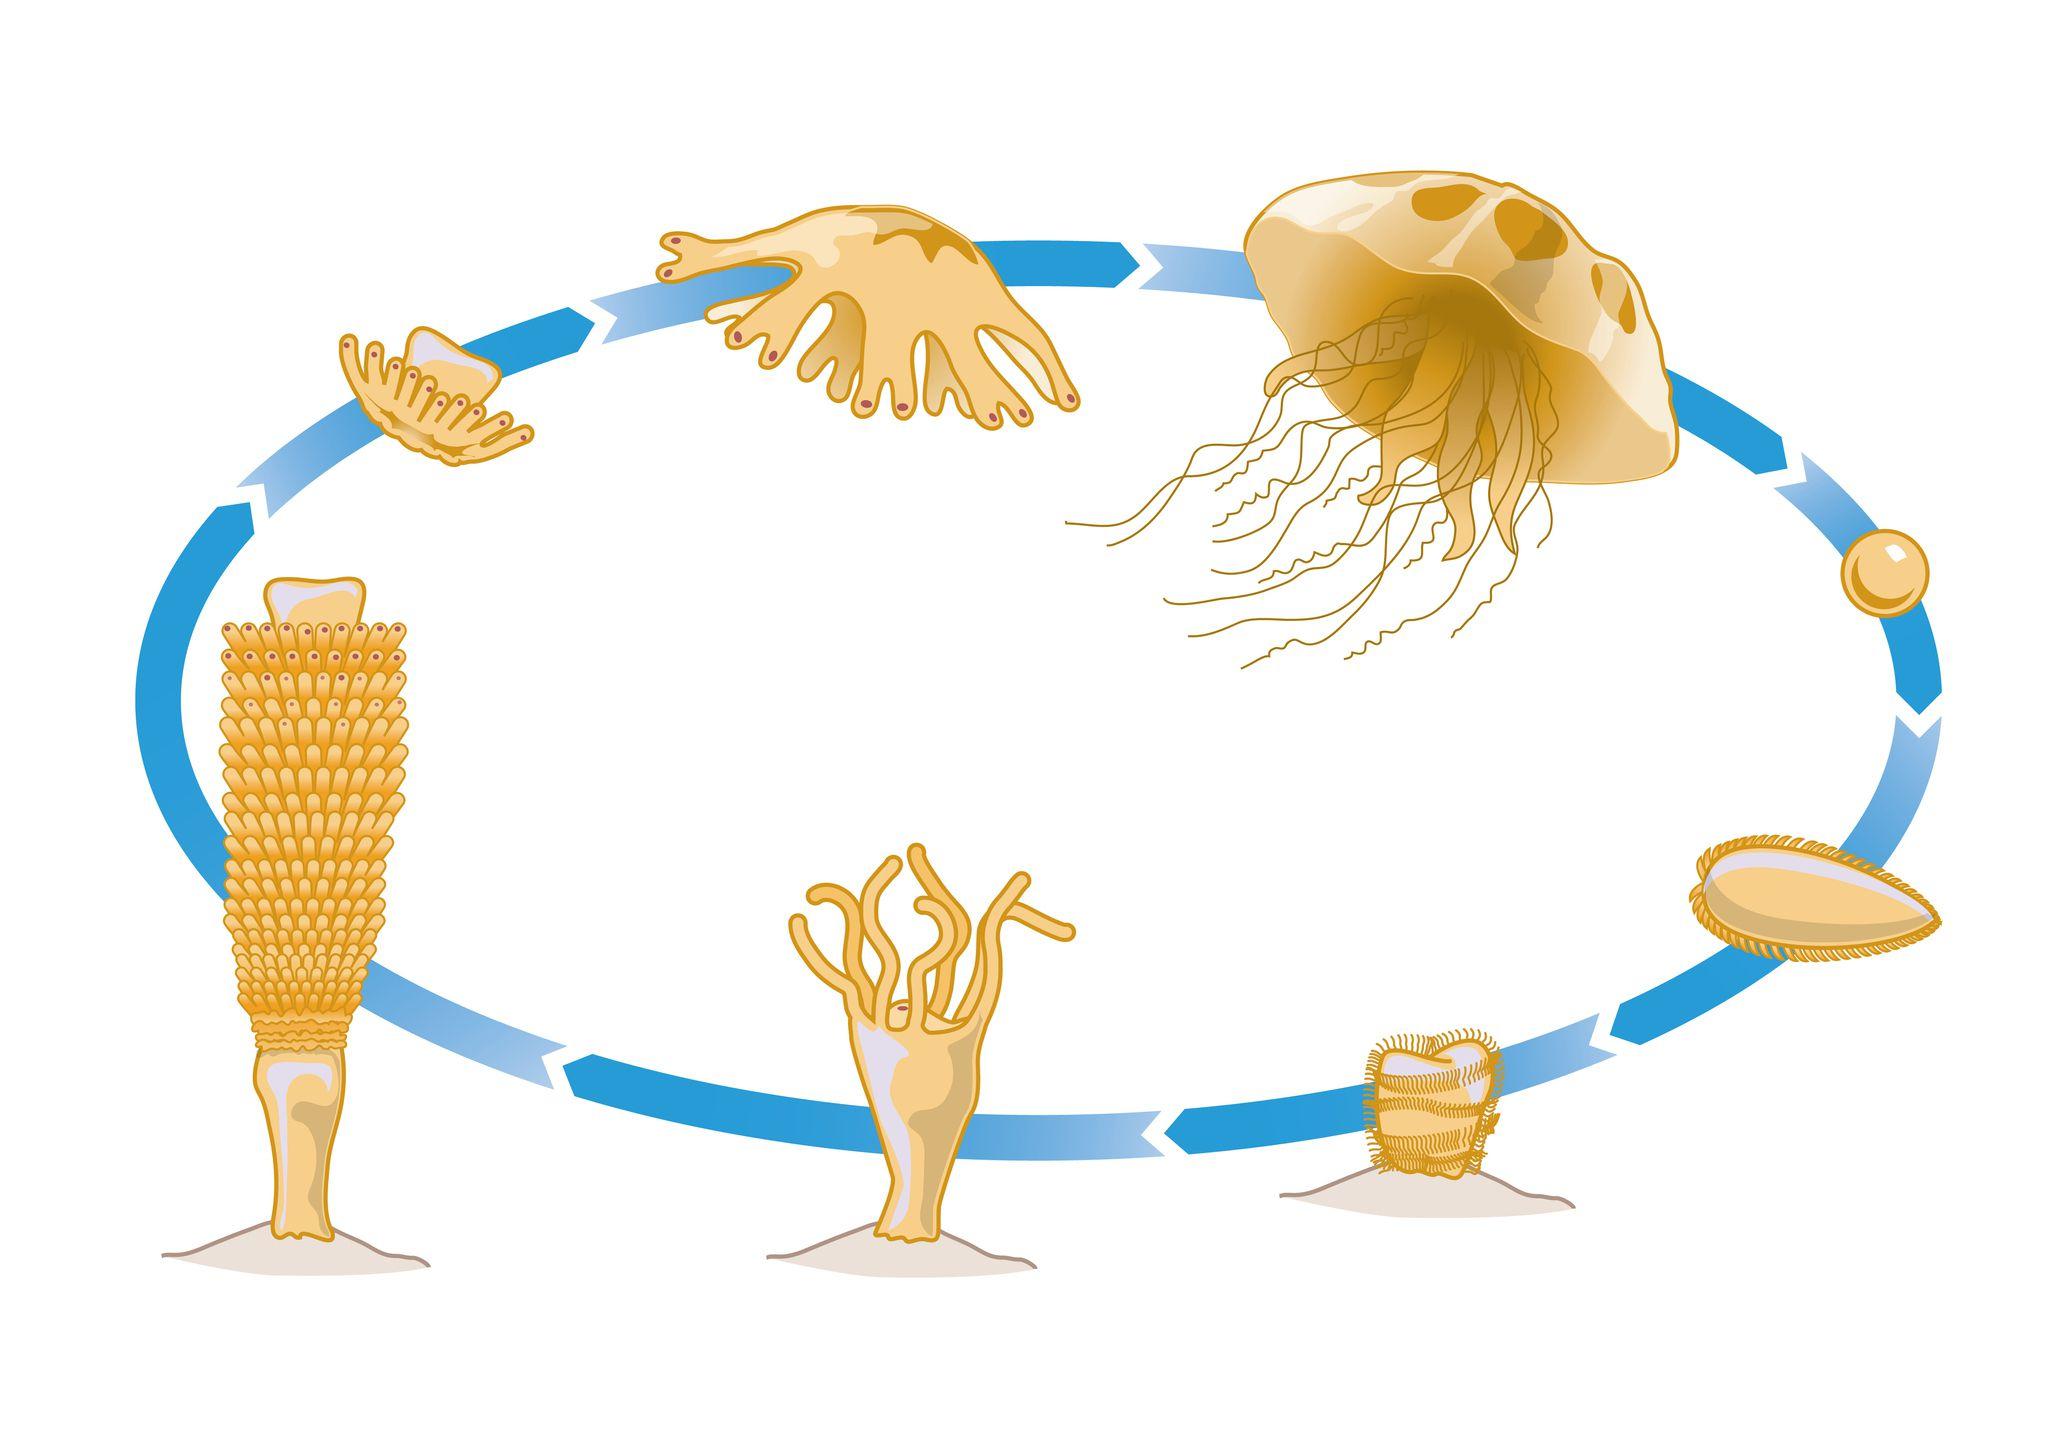 Jellyfish life cycle